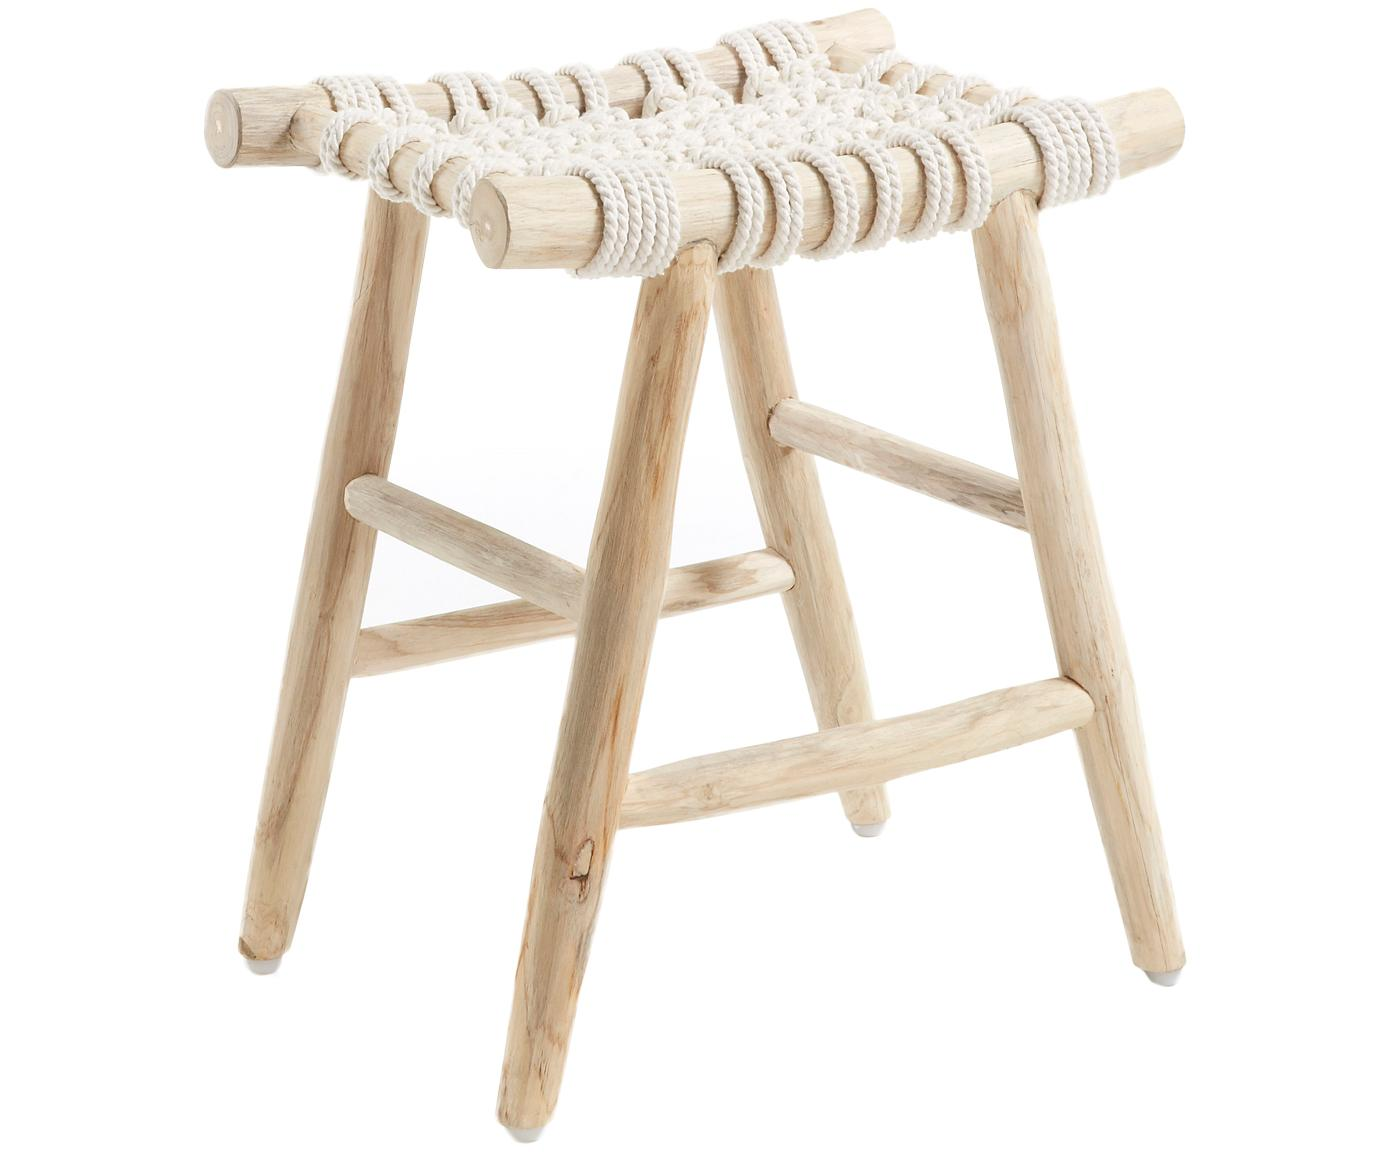 Sgabello in stile boho Edgard, Gambe: legno di teak, naturale, Seduta: corda di cotone, Legno di teak, bianco, Larg. 45 x Alt. 45 cm